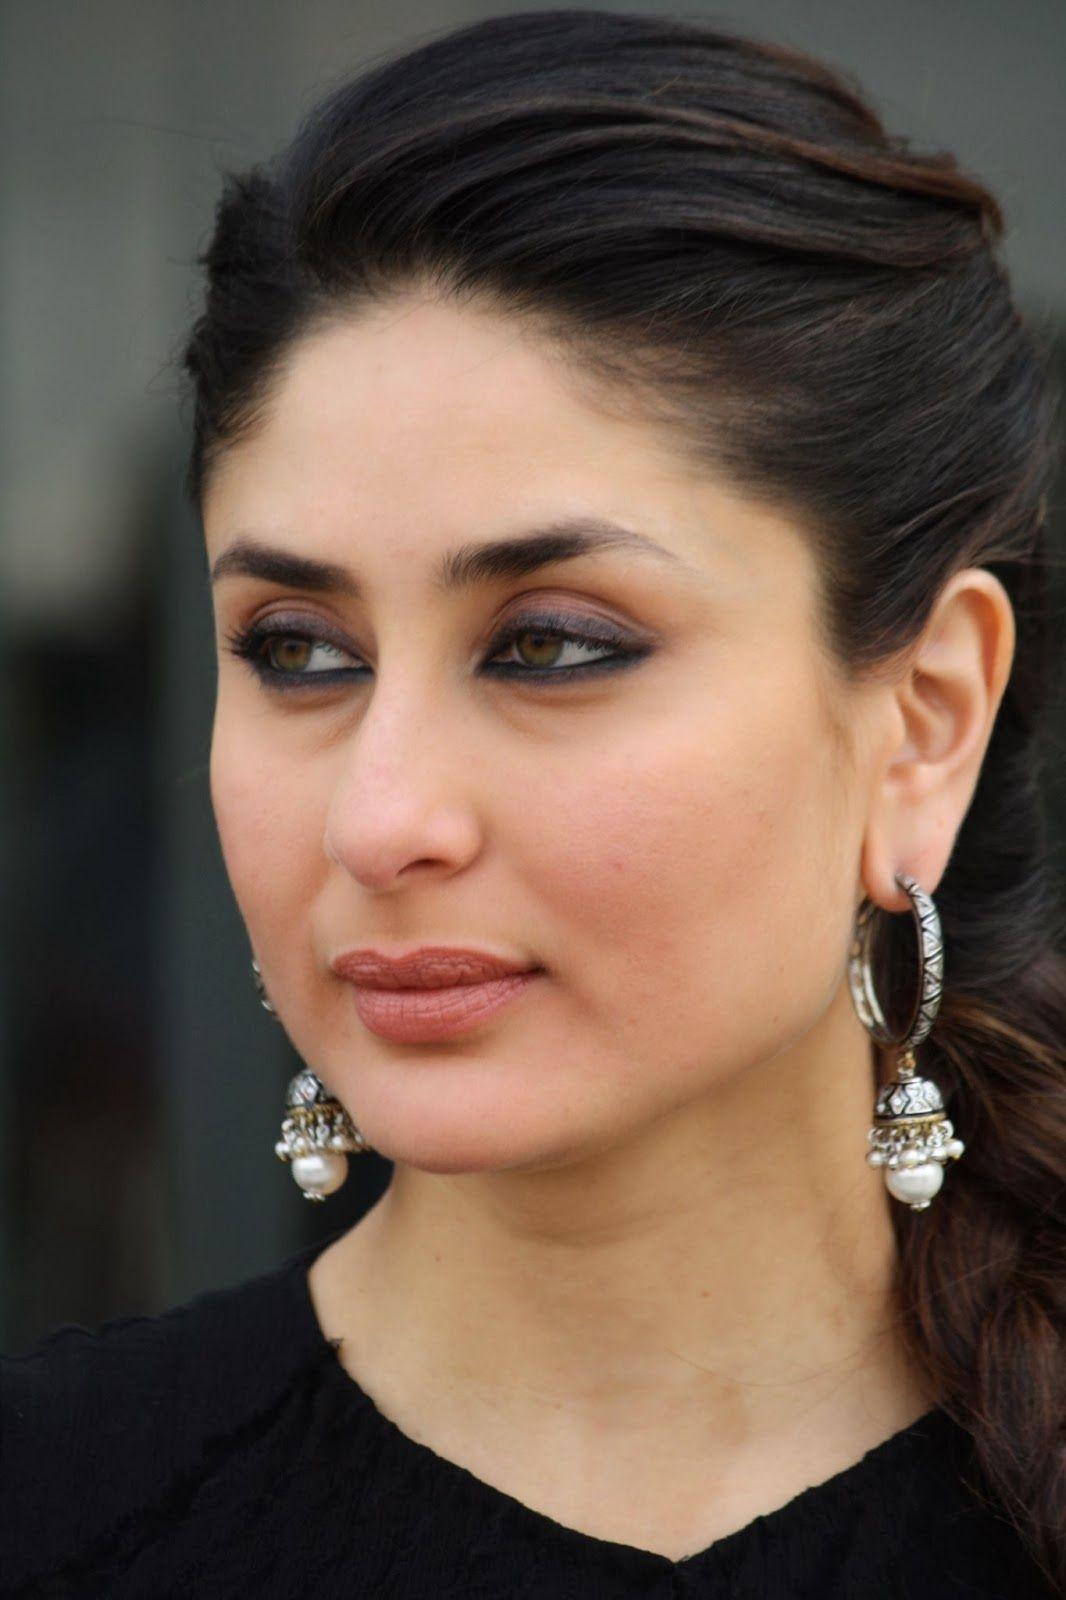 Glamorous Kareena Kapoor Photos In Black Dress Kareena Kapoor Photos Kareena Kapoor Beautiful Bollywood Actress